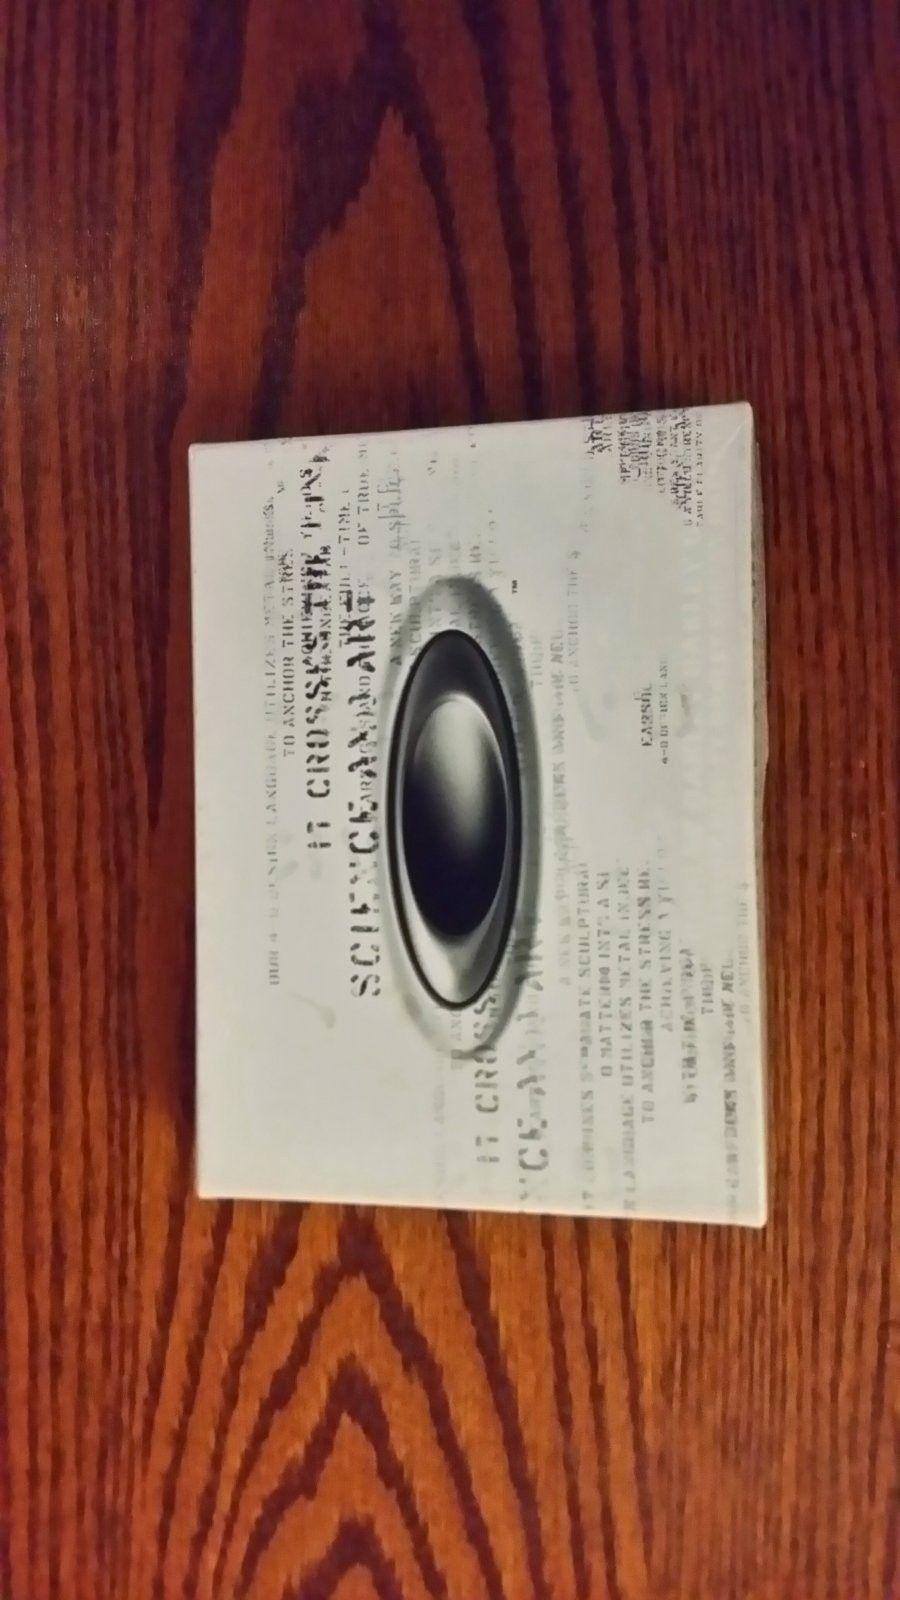 Oakley Business Card Holder - Avanti Court Primary School